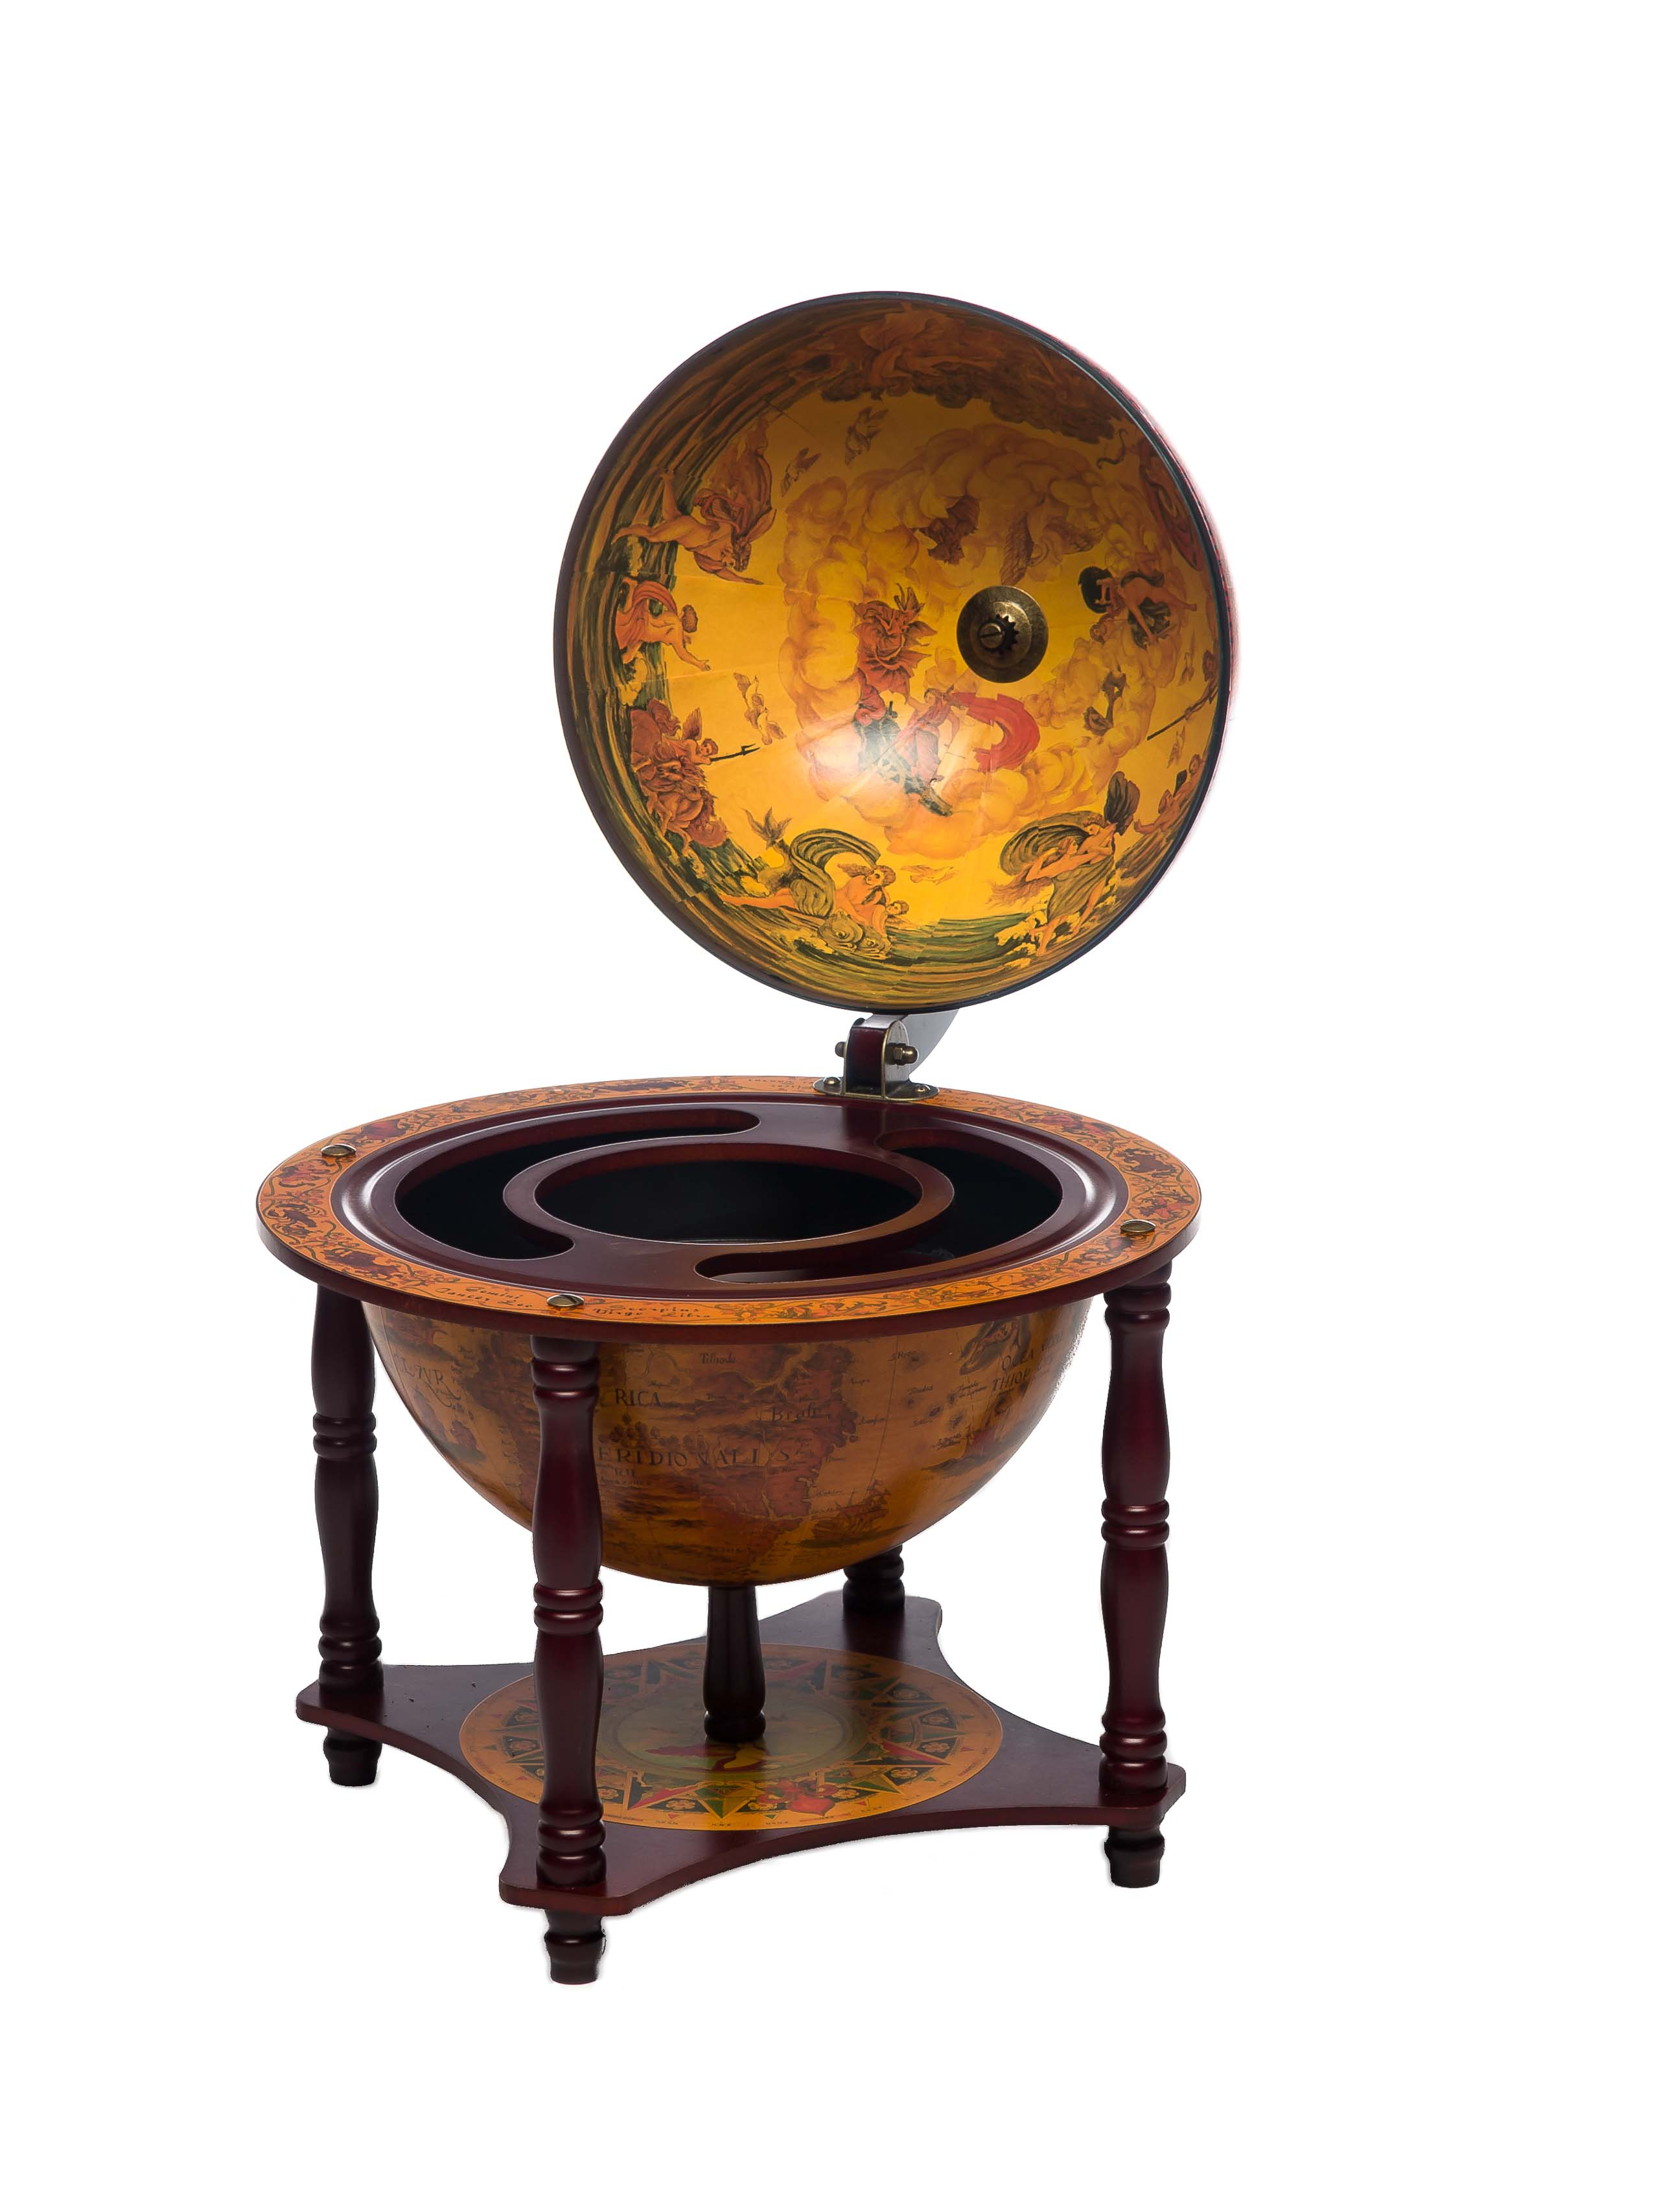 globusbar globus bar hausbar minibar servierwagen weltkugel globe bar aubaho. Black Bedroom Furniture Sets. Home Design Ideas